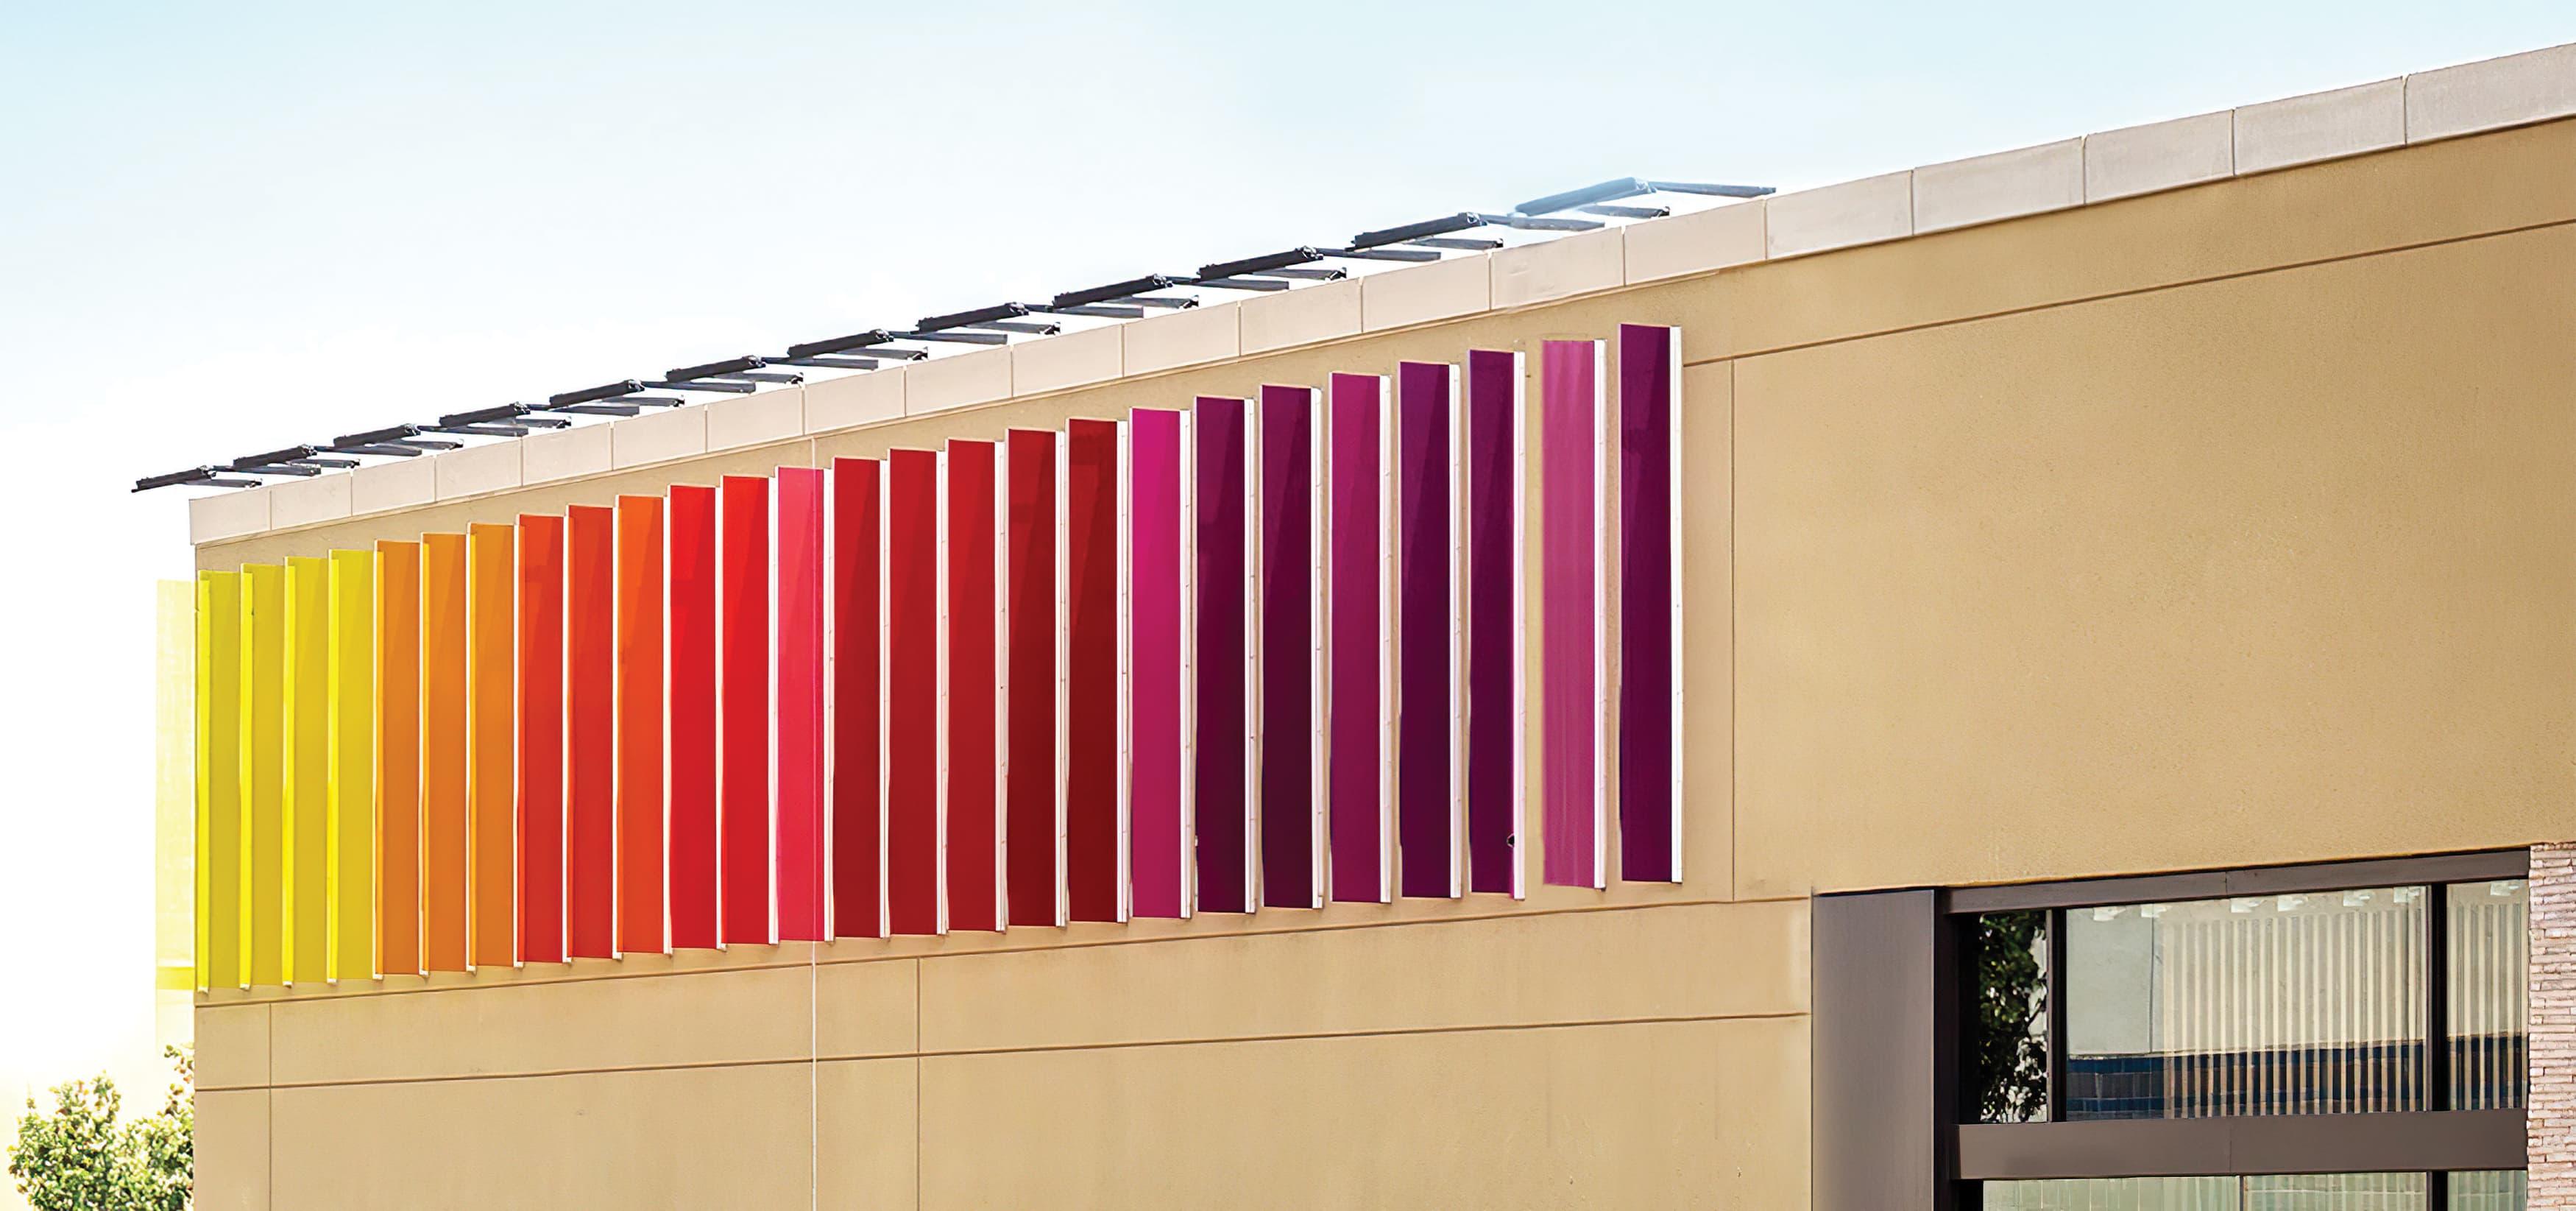 Monet Avenue shopping district architectural graphic design